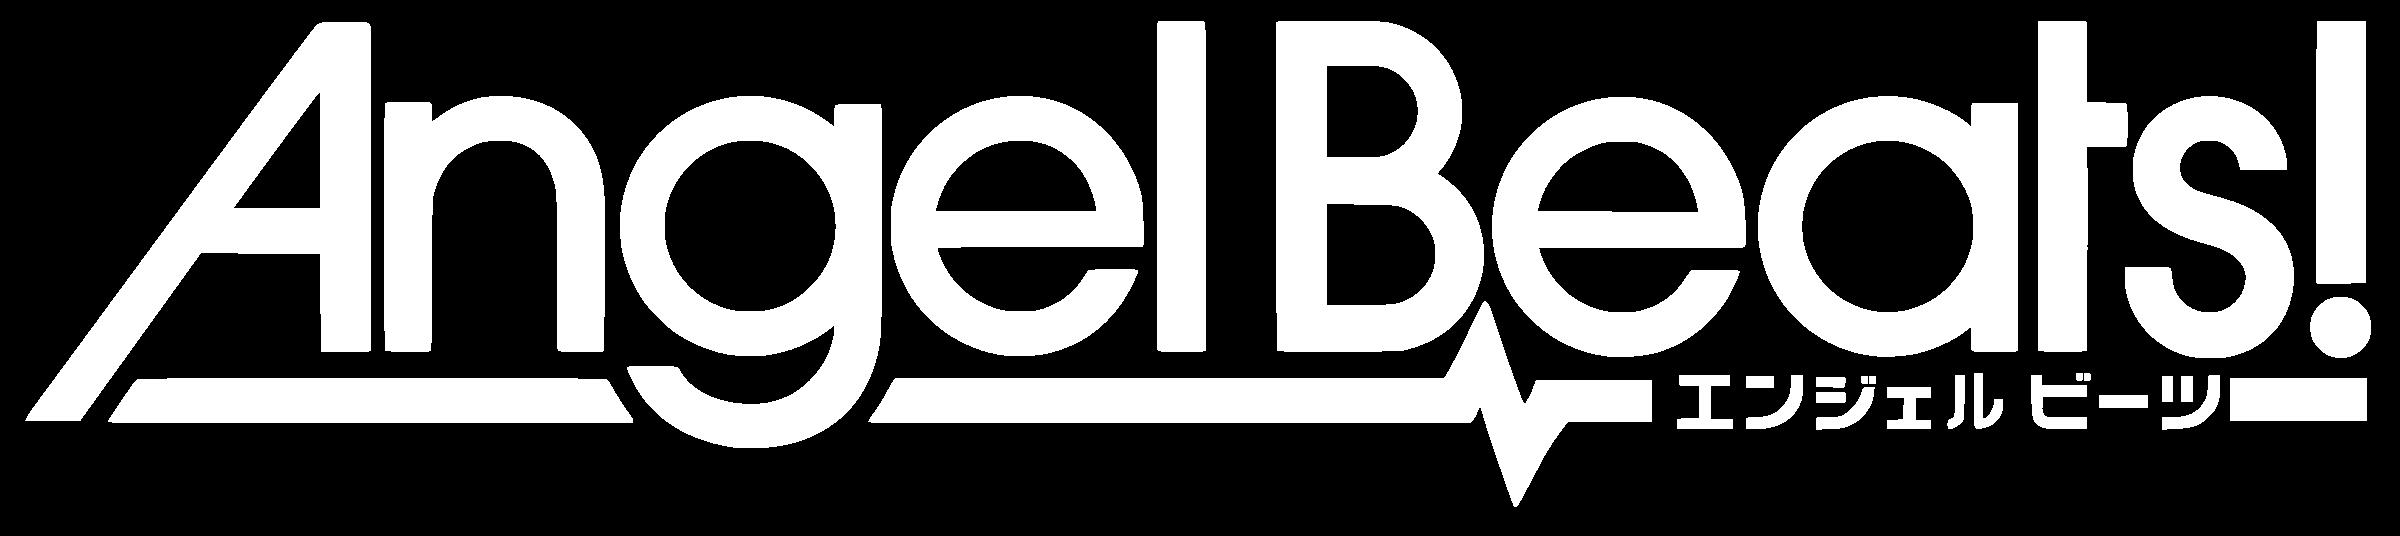 Angel Beats Logo PNG Transparent & SVG Vector.